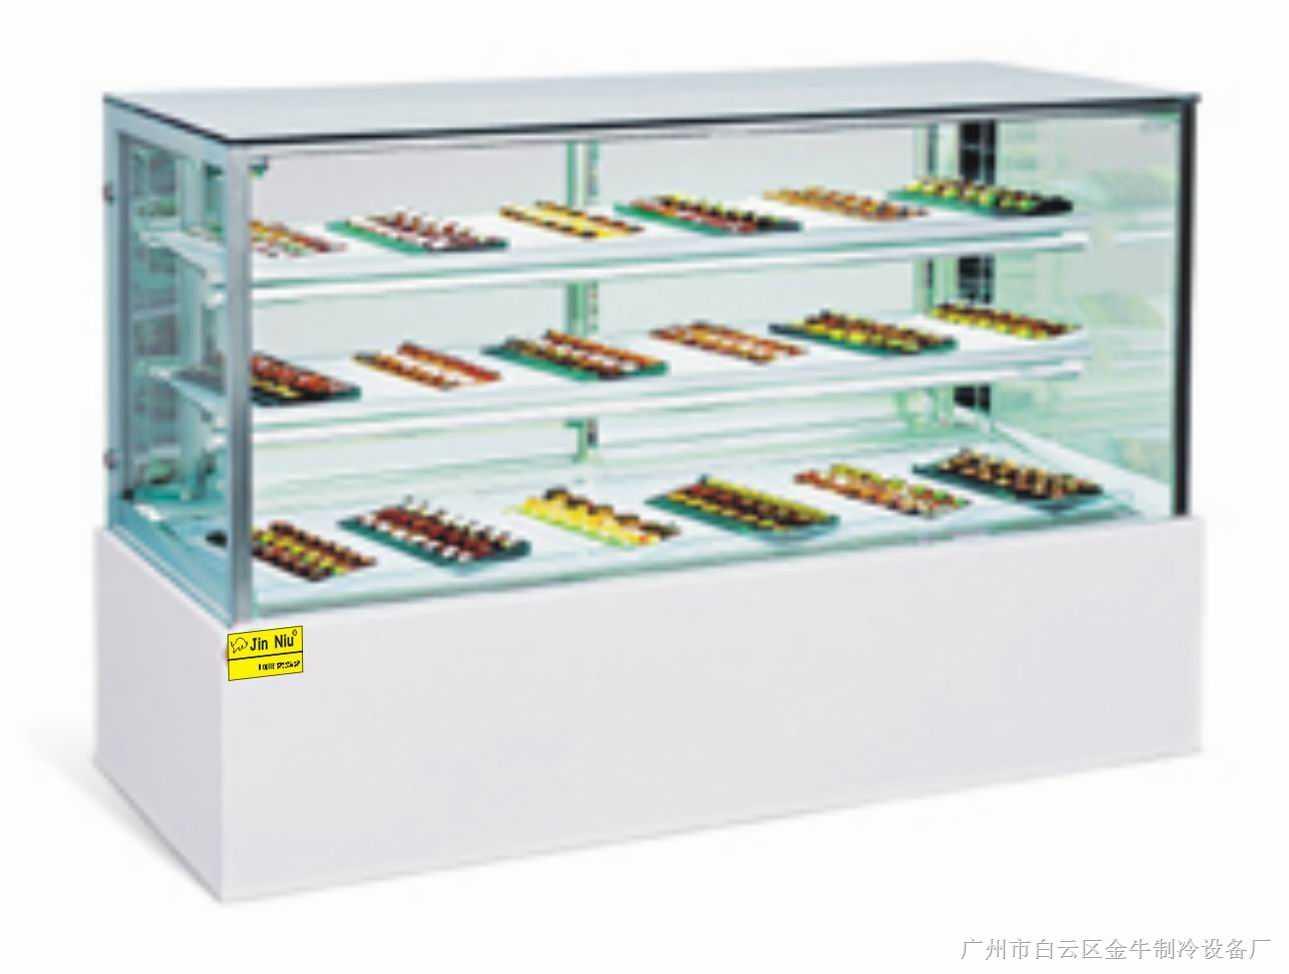 SCLG4-1500FS巧克力展示柜、巧克力冷藏柜、食品保鲜柜、陈列柜